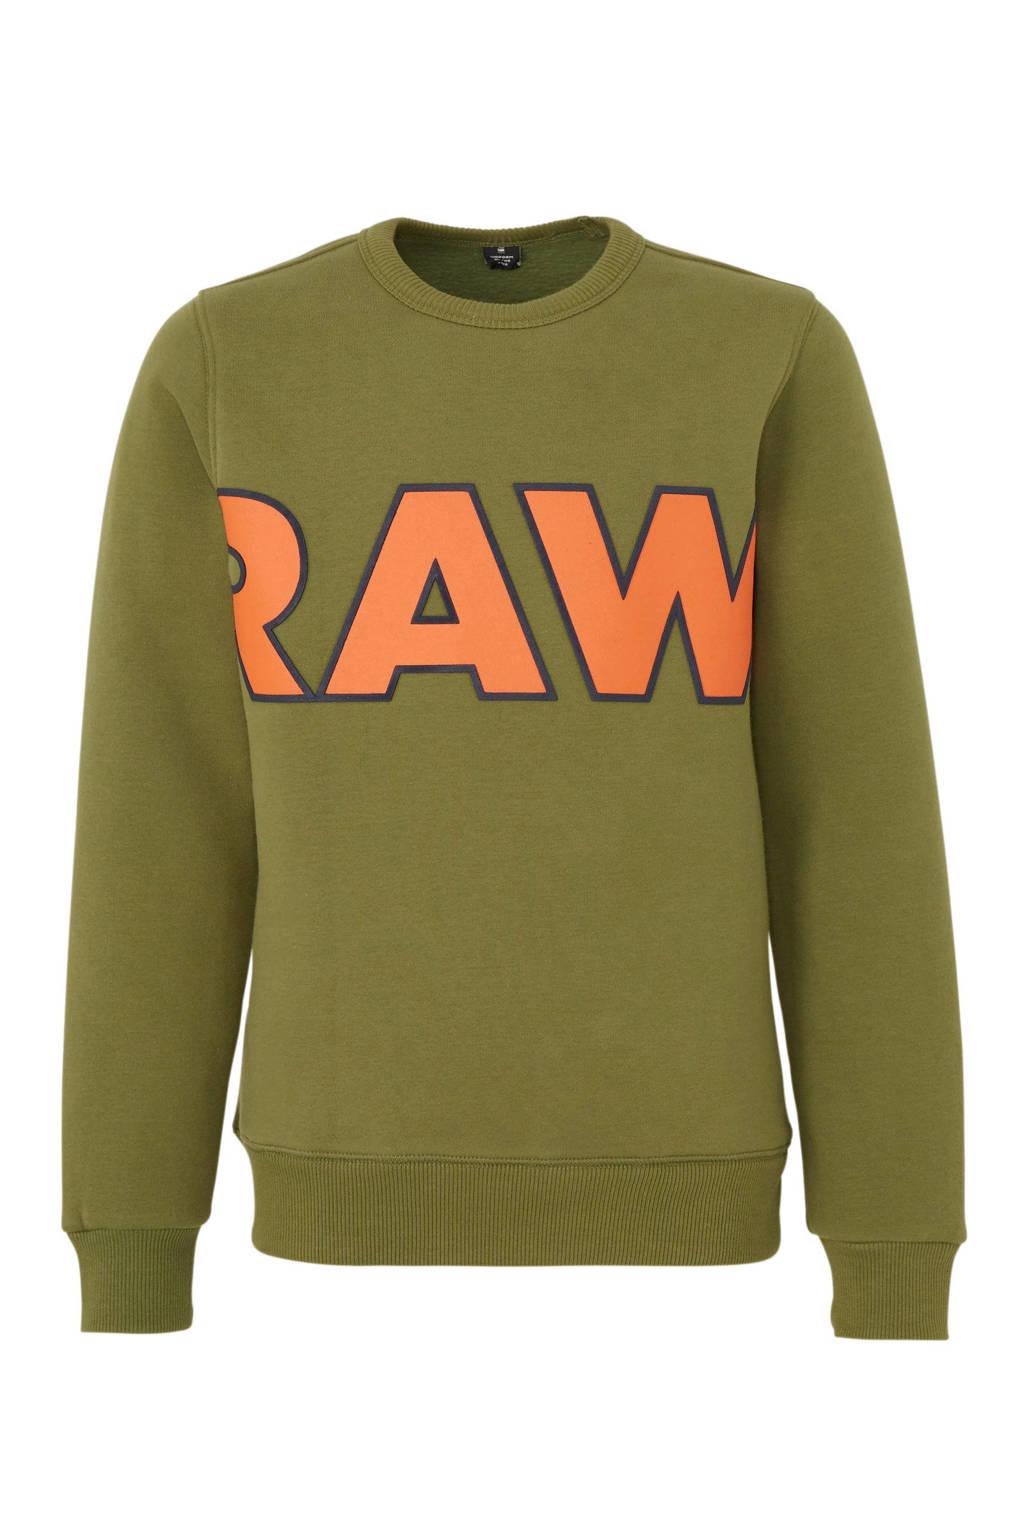 G-Star RAW sweater met tekst kaki groen, Kaki groen